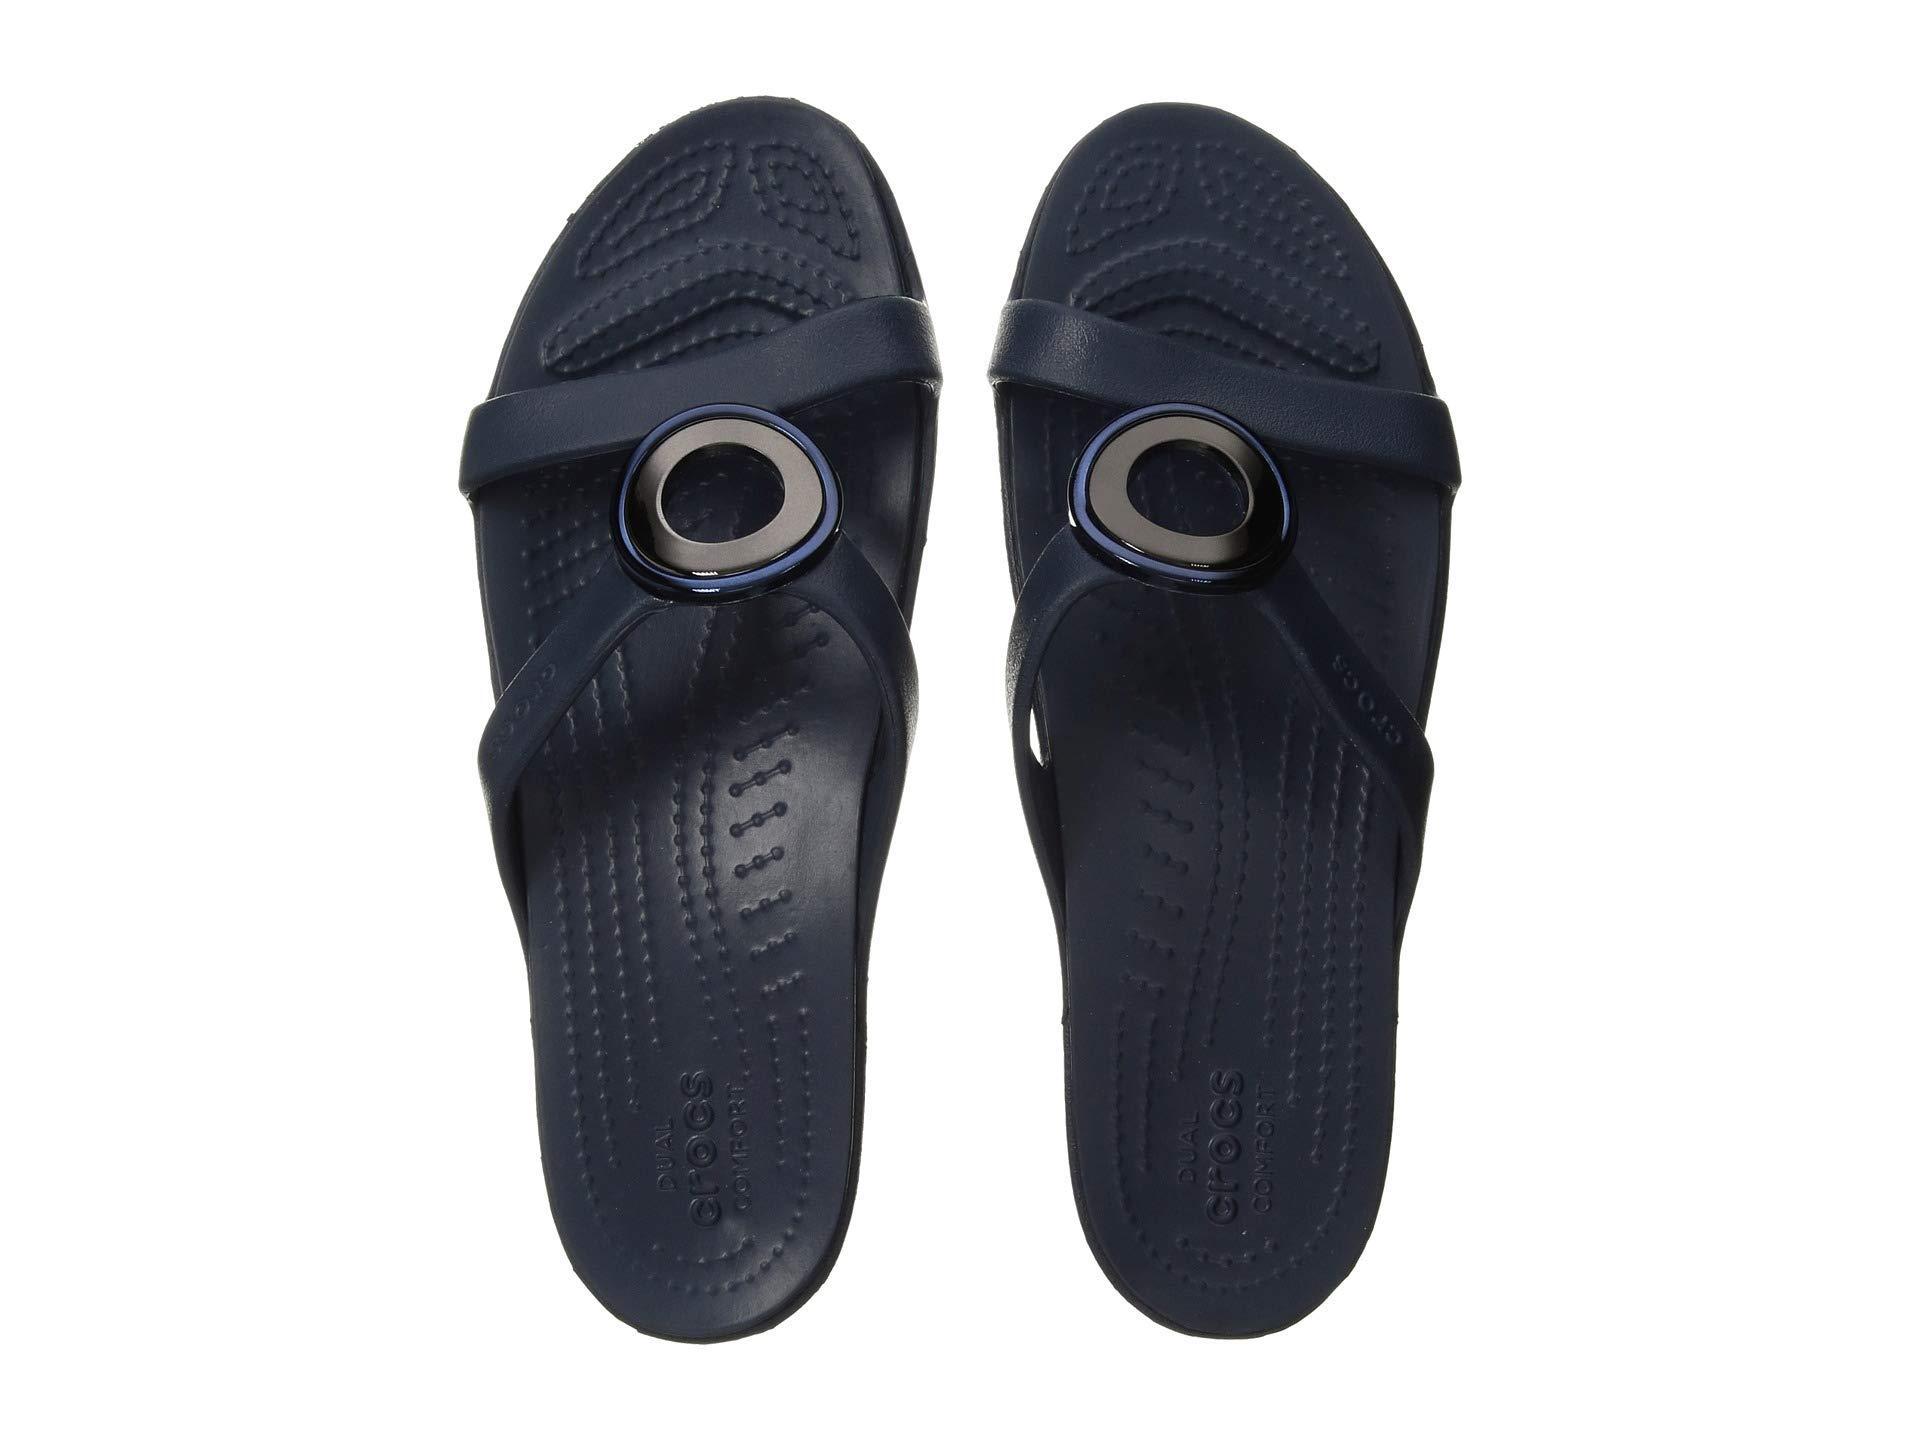 85b54c4269f Lyst - Crocs™ Sanrah Metal Block Sandal (silver navy) Women s ...